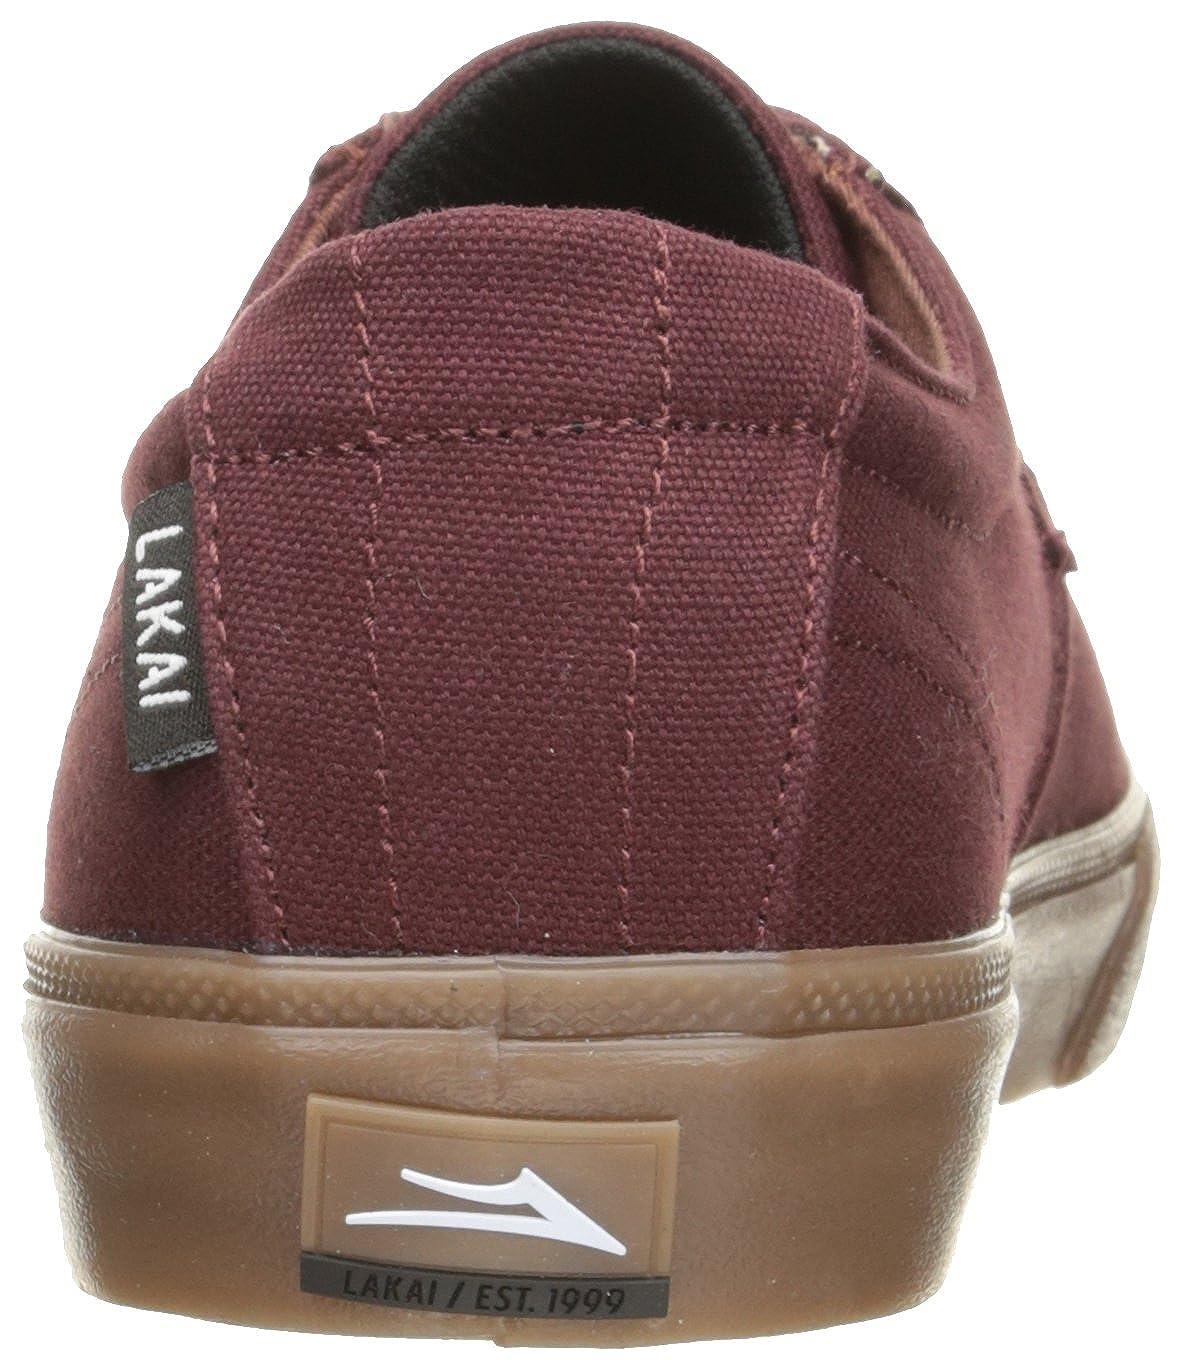 Lakai Mens Daly Skateboarding Shoe Lakai Limited Footwear